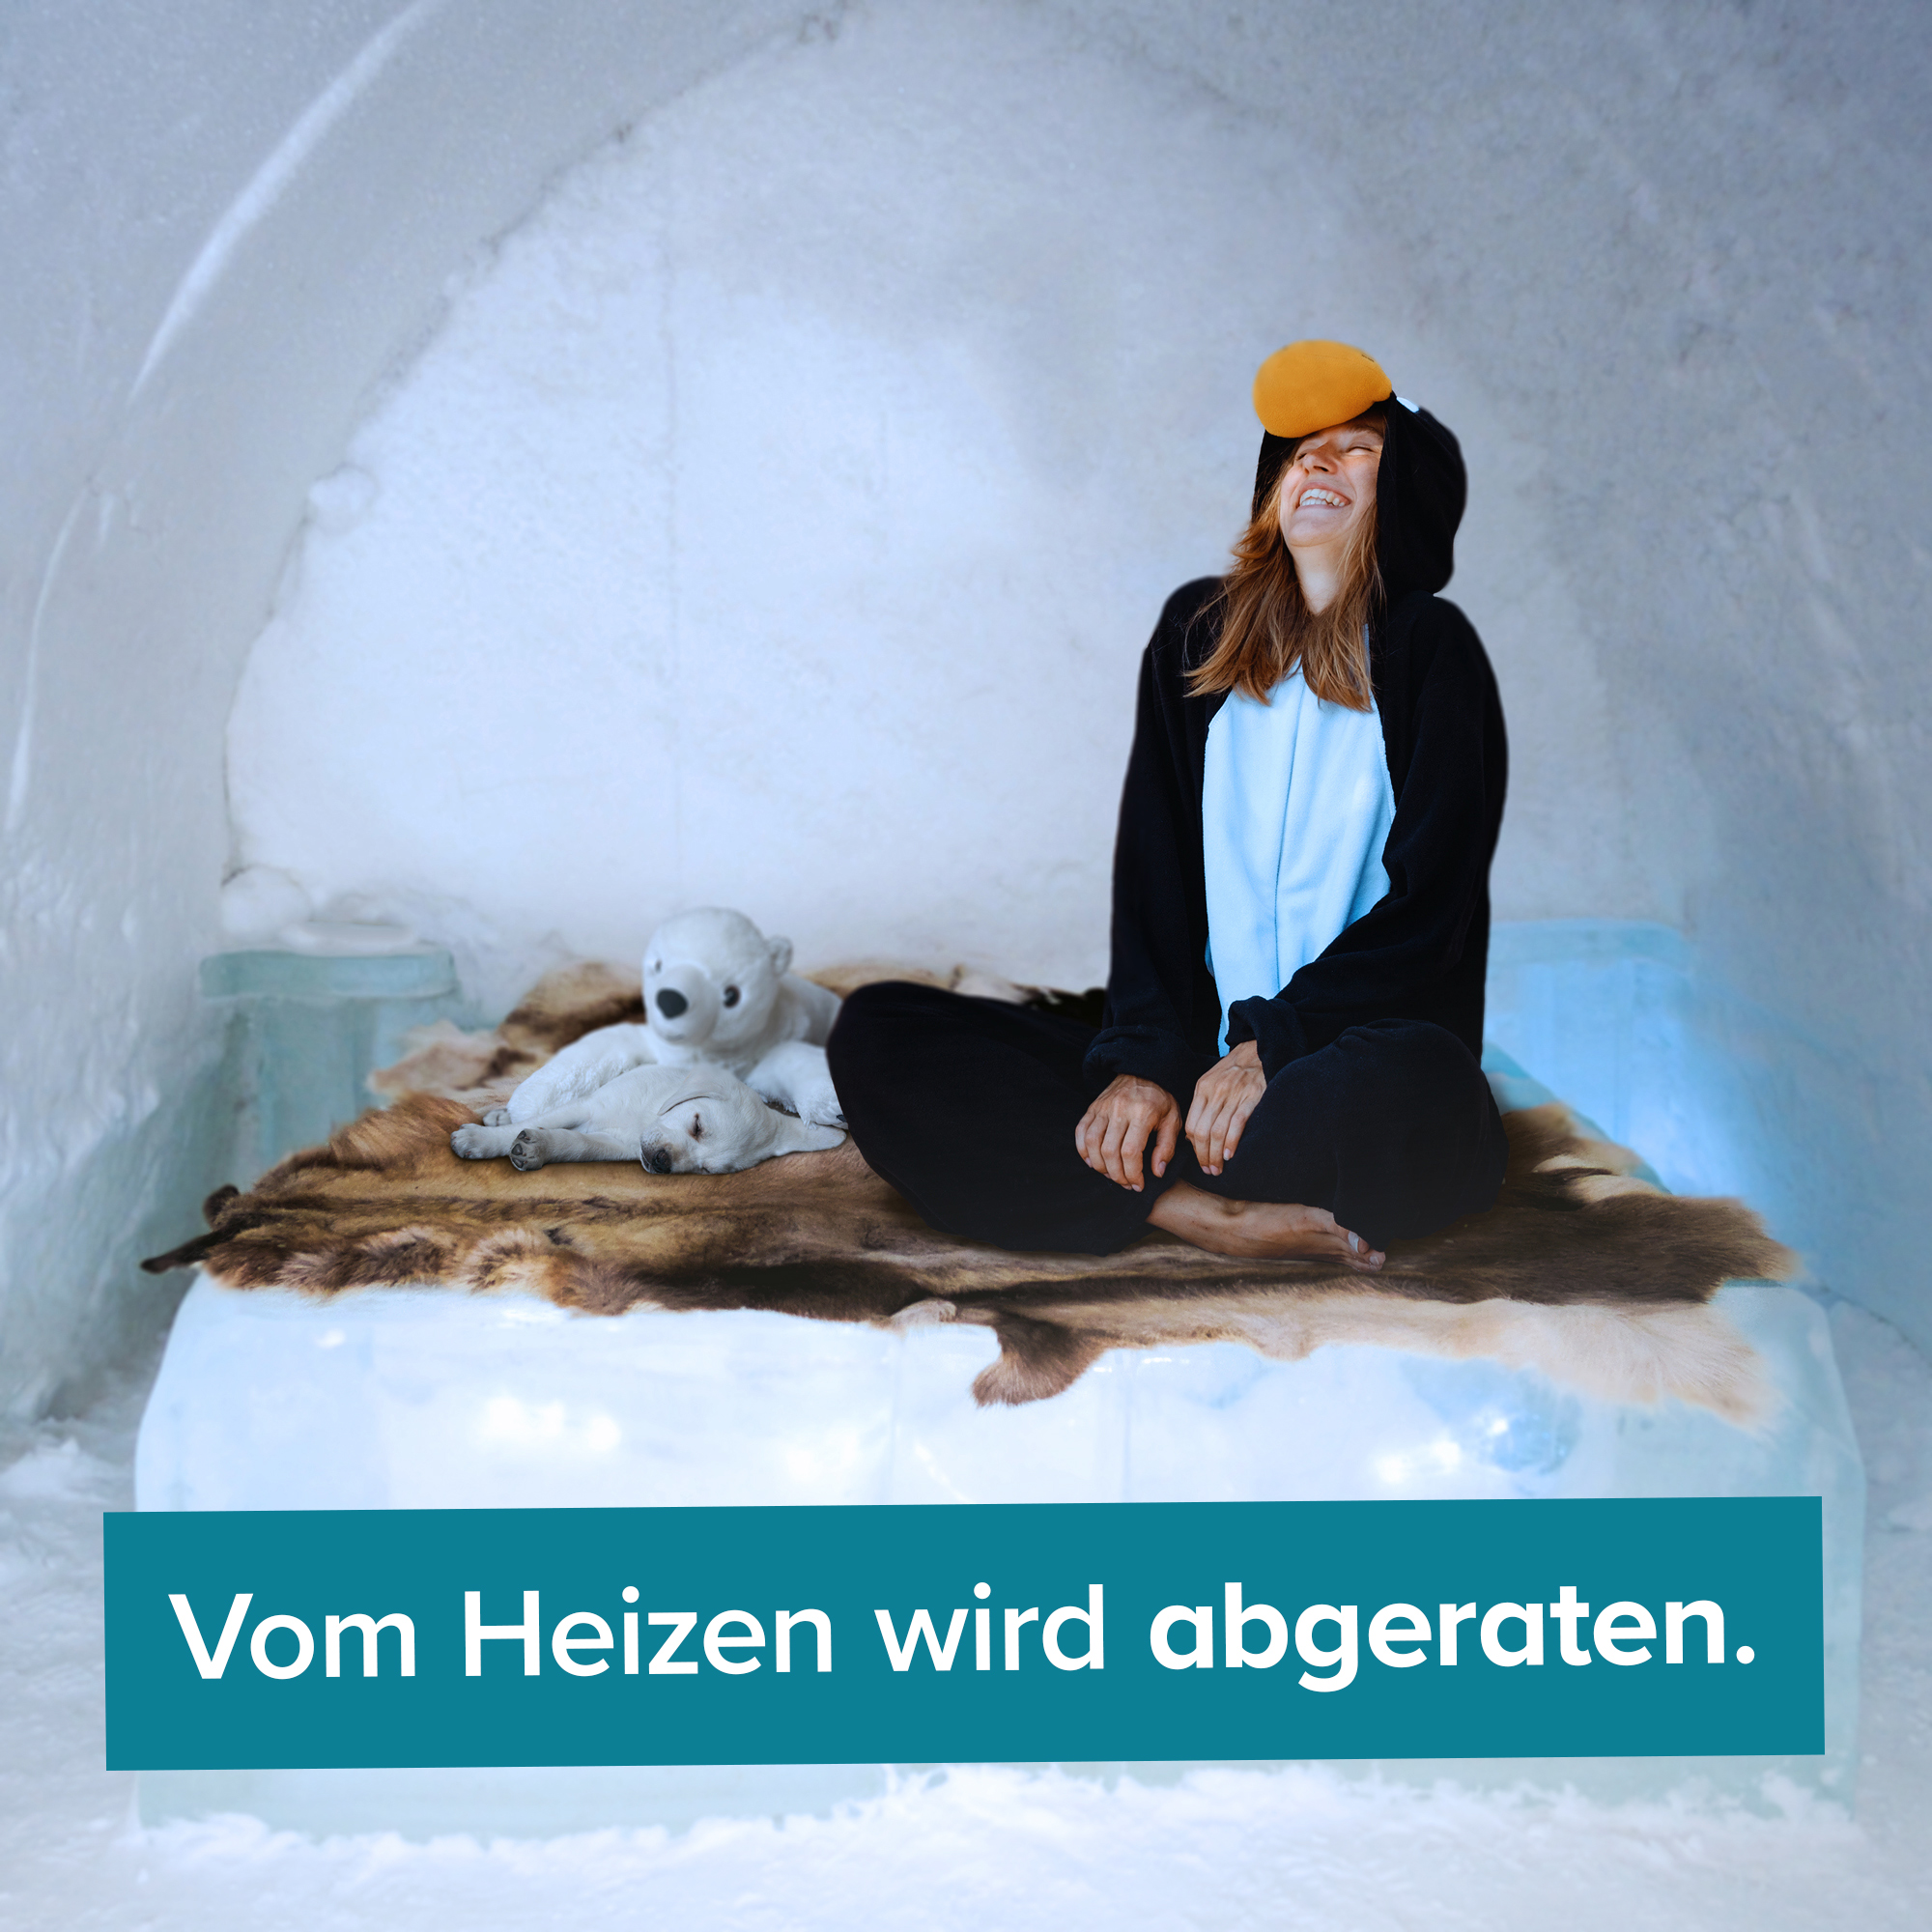 Iglu Bausatz für zuhause - Igloo yourself - 8